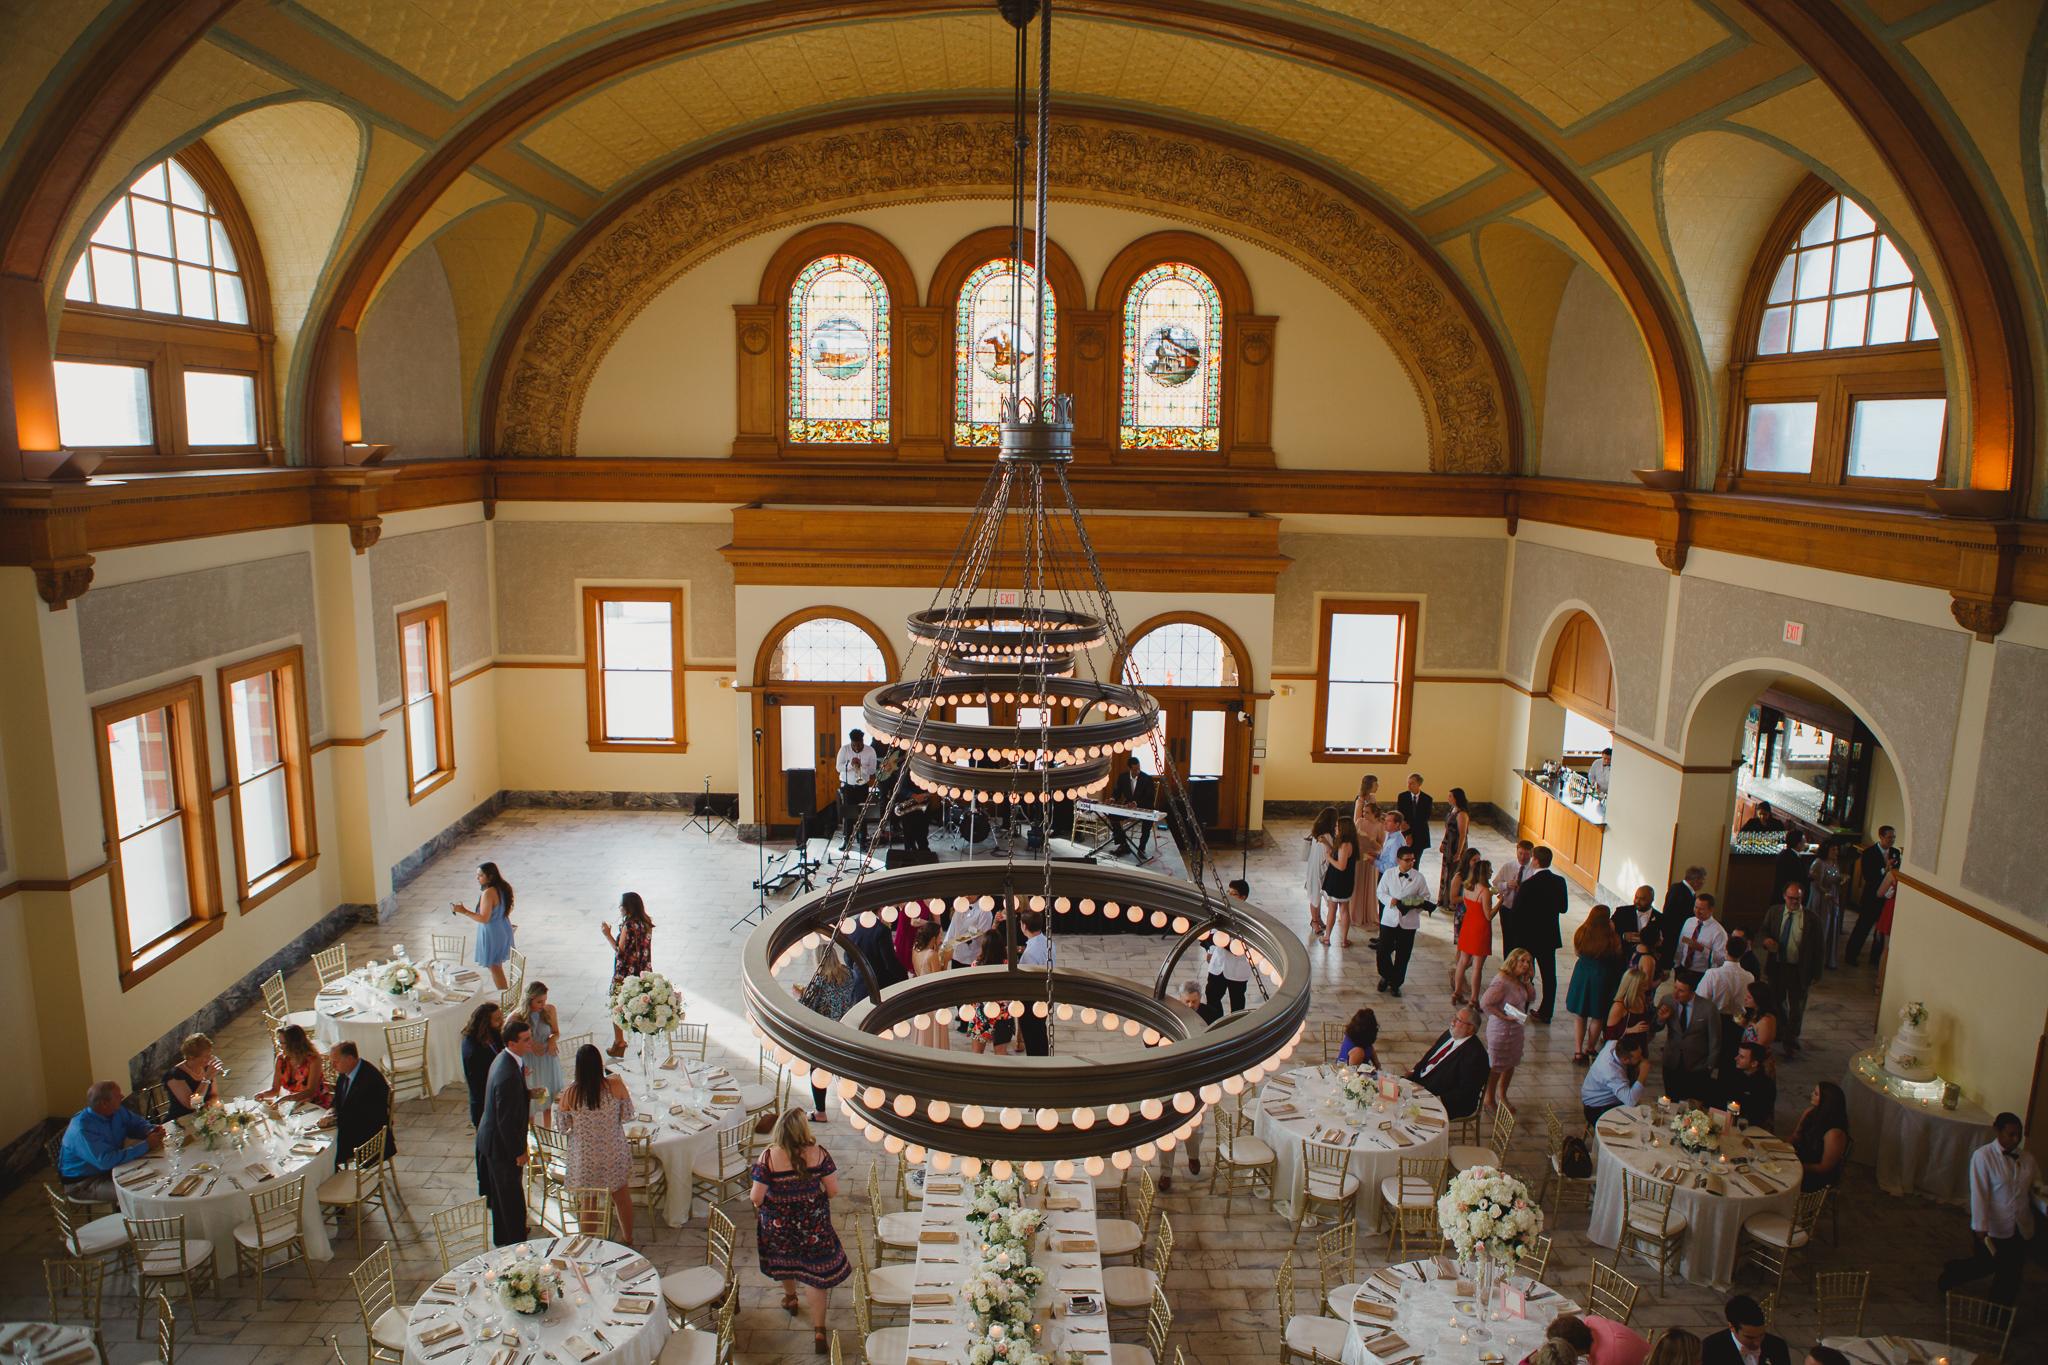 Michael and Kelly - the ashton depot - wedding DFW - wedding photographer- elizalde photography (87 of 150).jpg